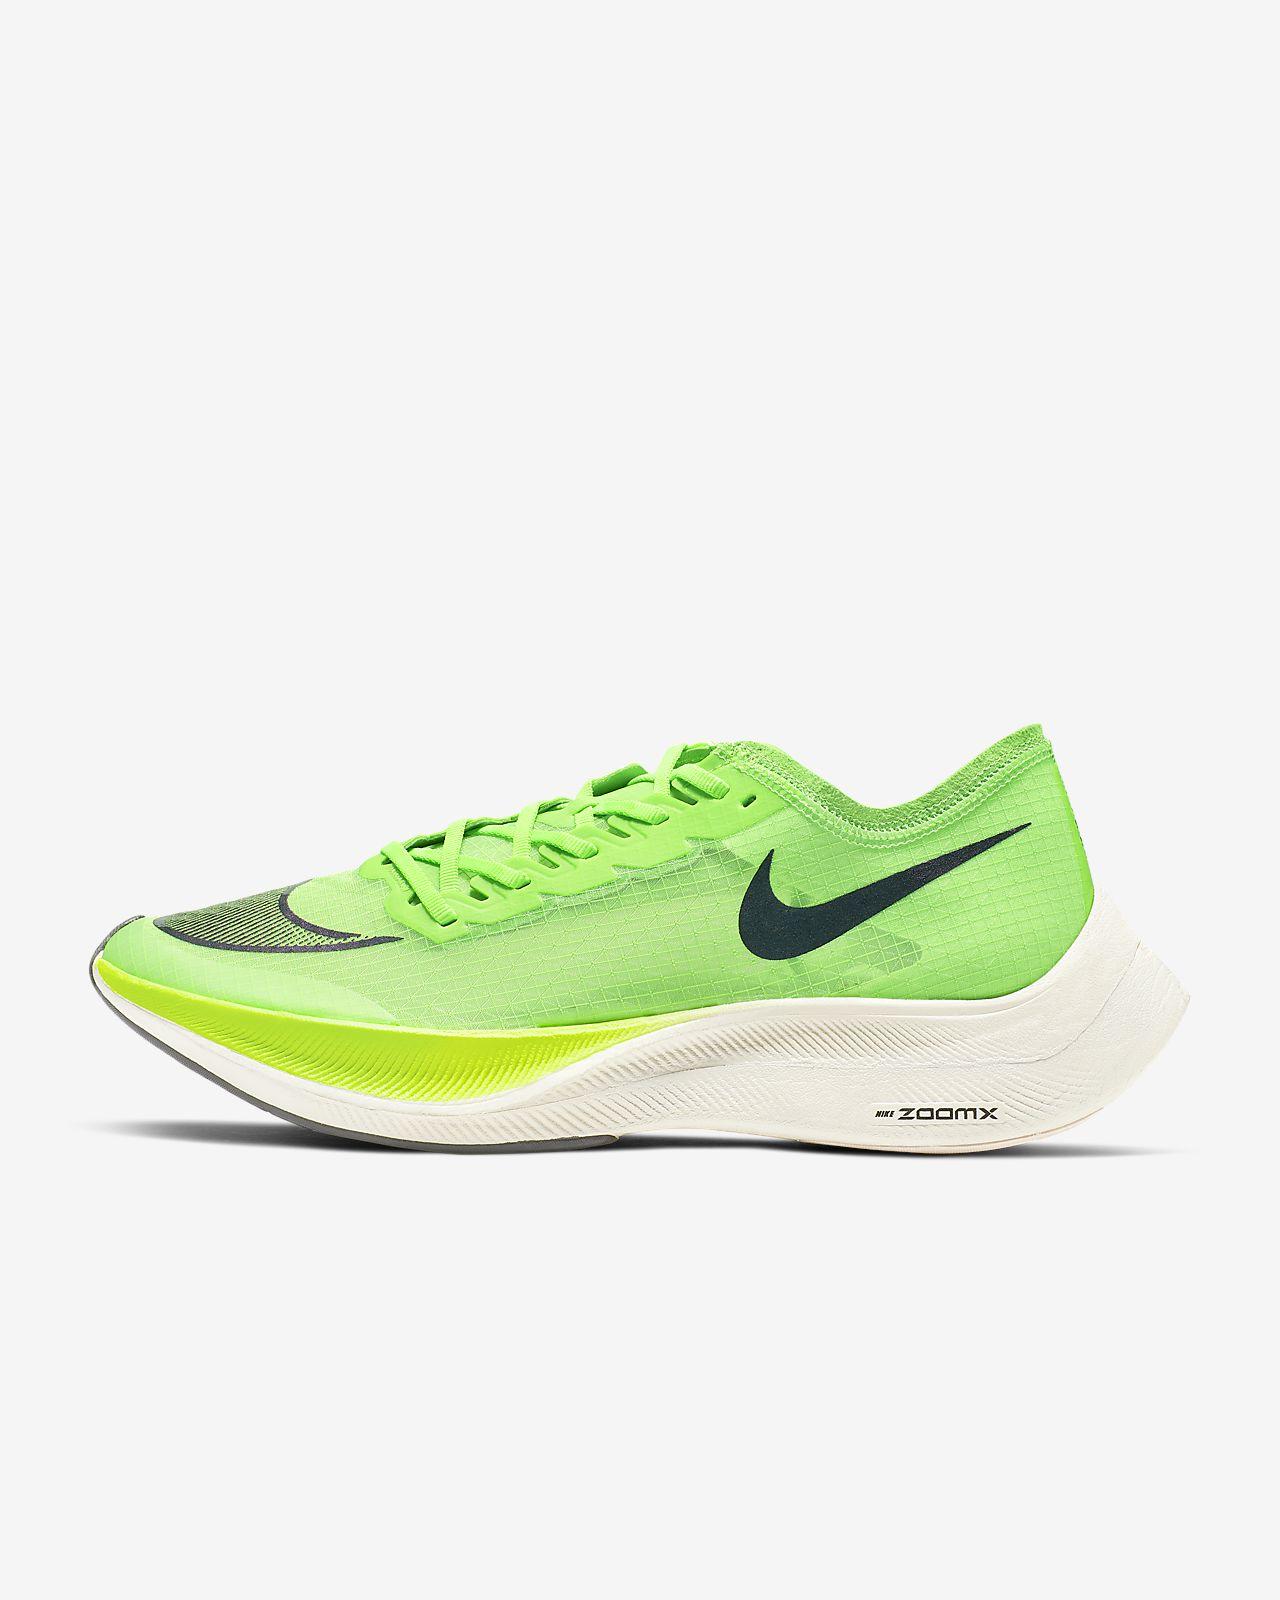 Löparsko Nike ZoomX Vaporfly NEXT%